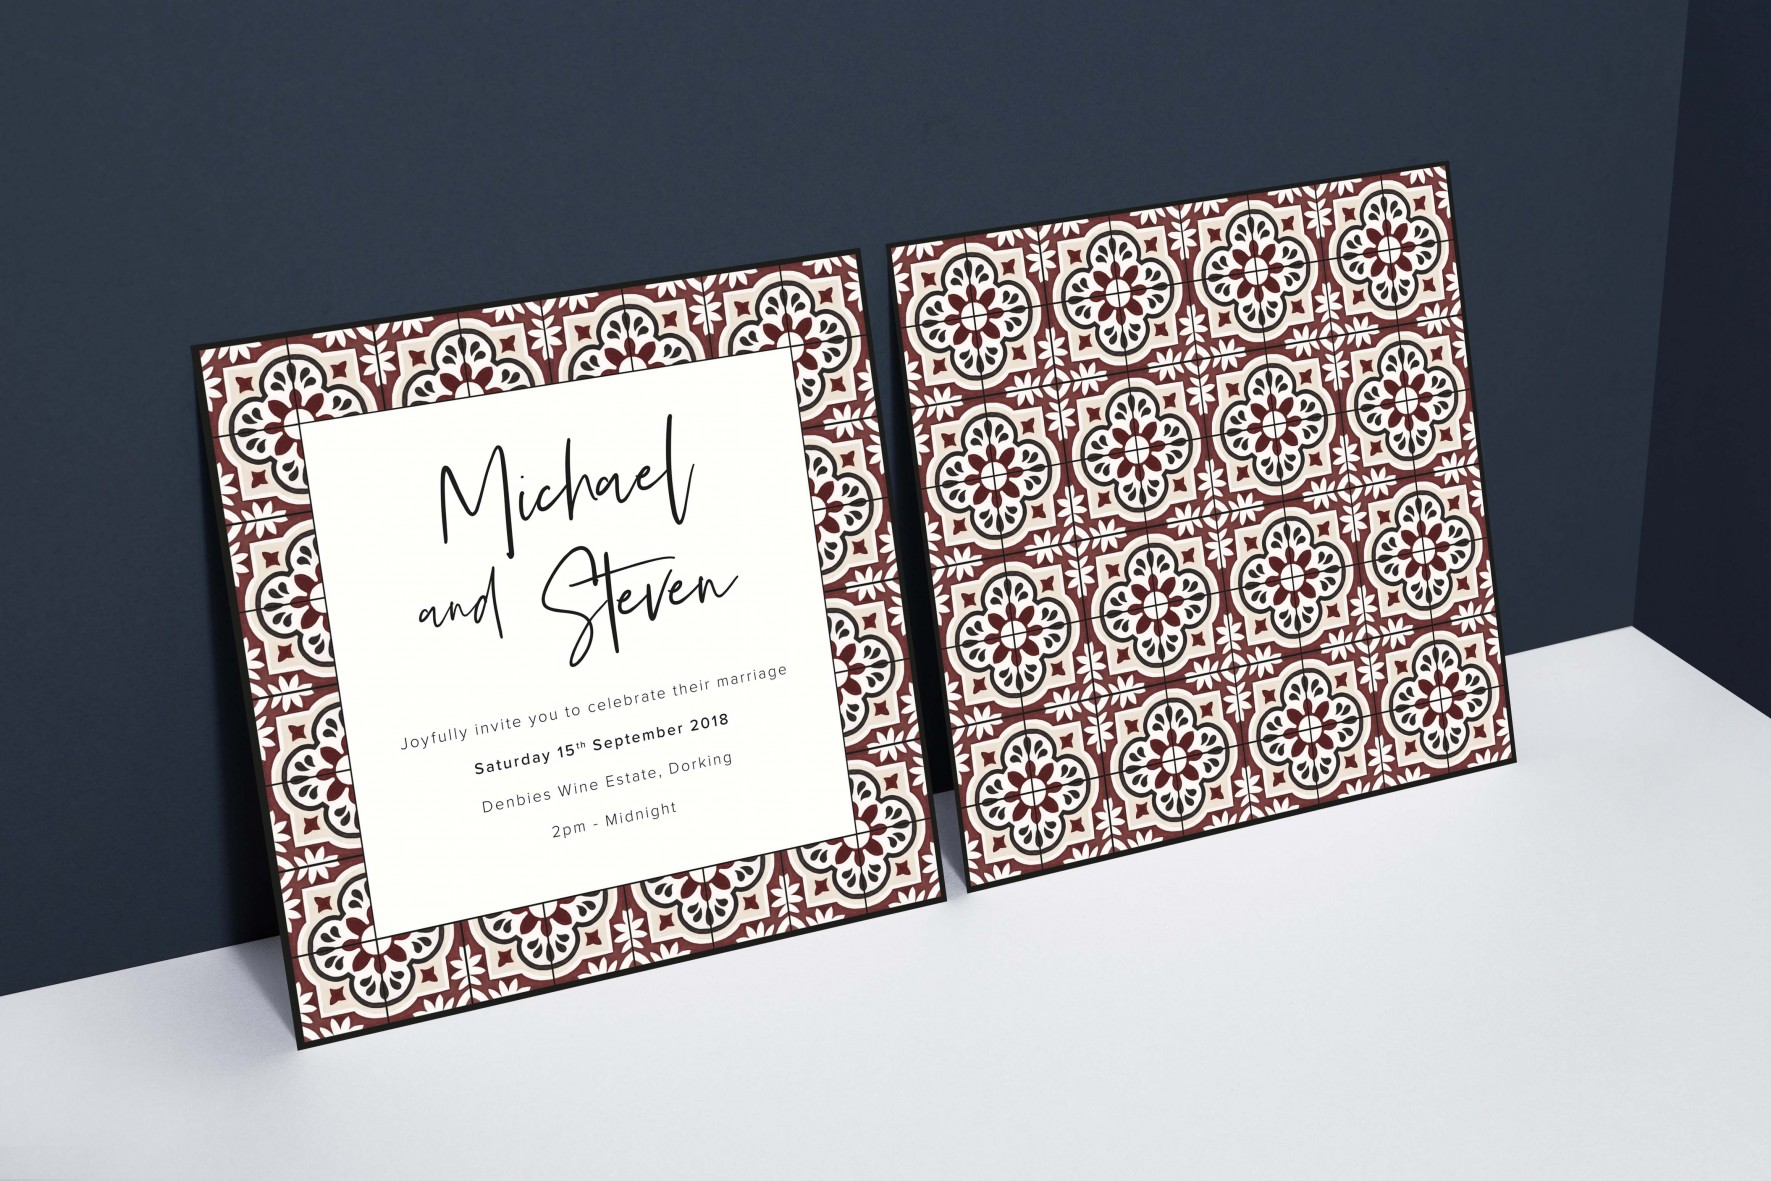 watercolour tile pattern masculine wedding invitation - gay wedding- stationery by www.rosepaperscissors.com